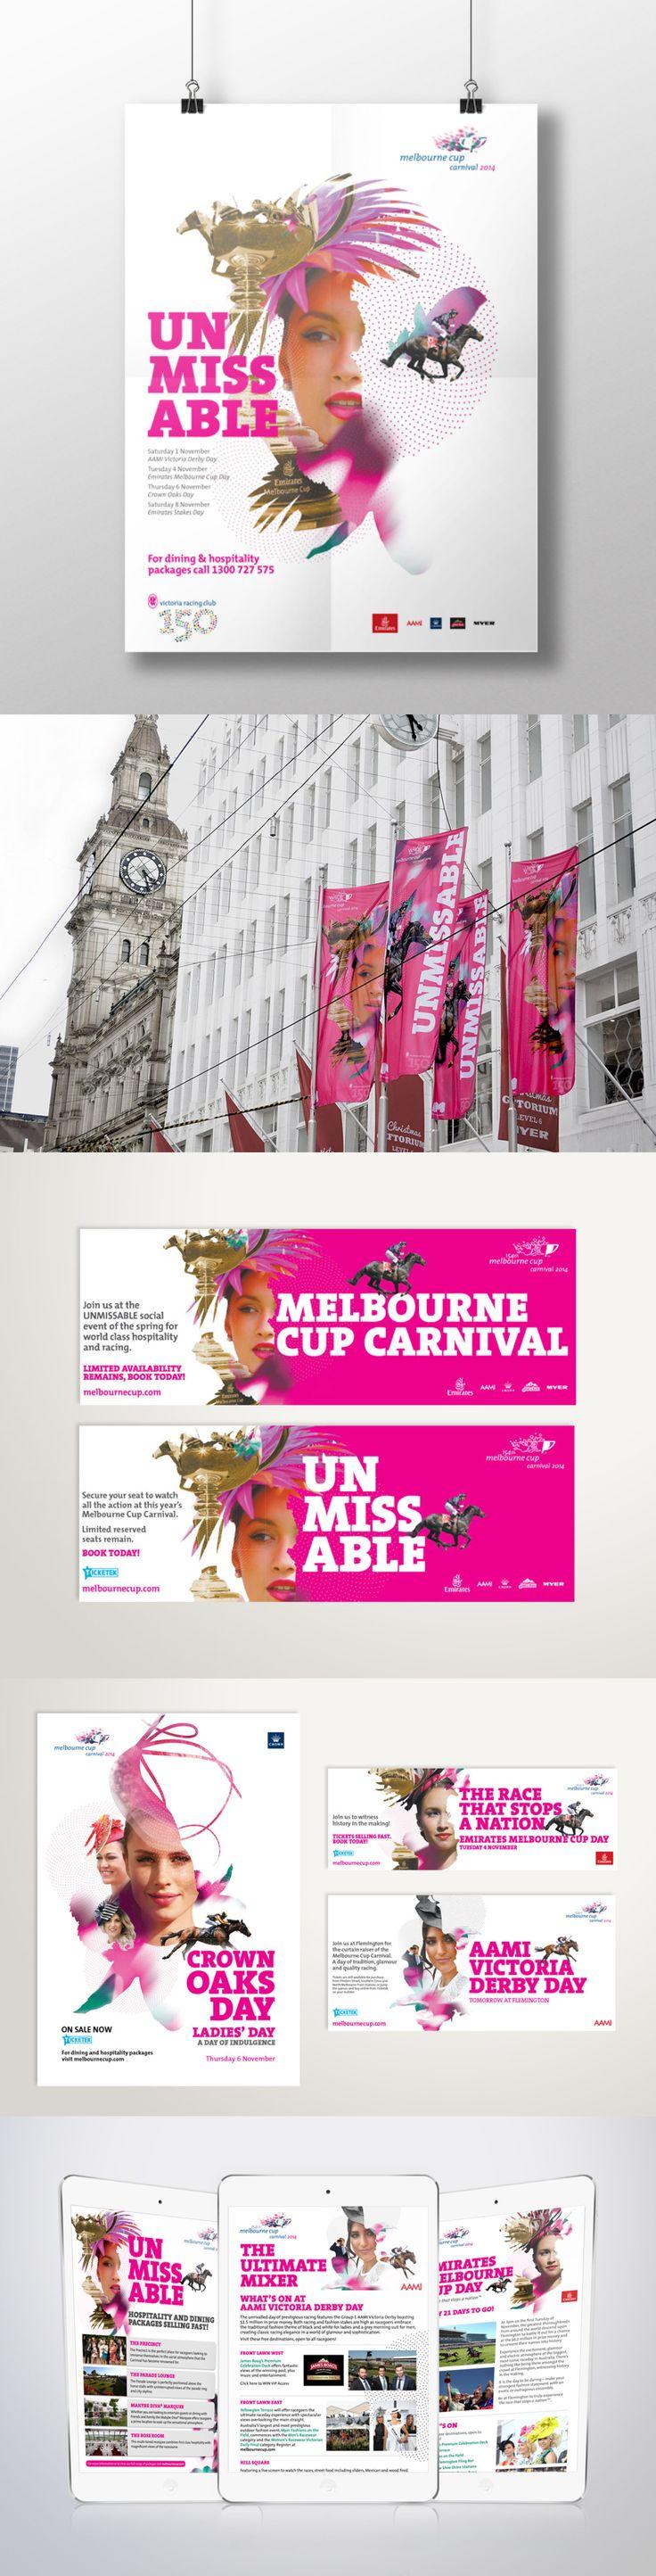 Melbourne Cup Carnival Creative – Advertising Associates